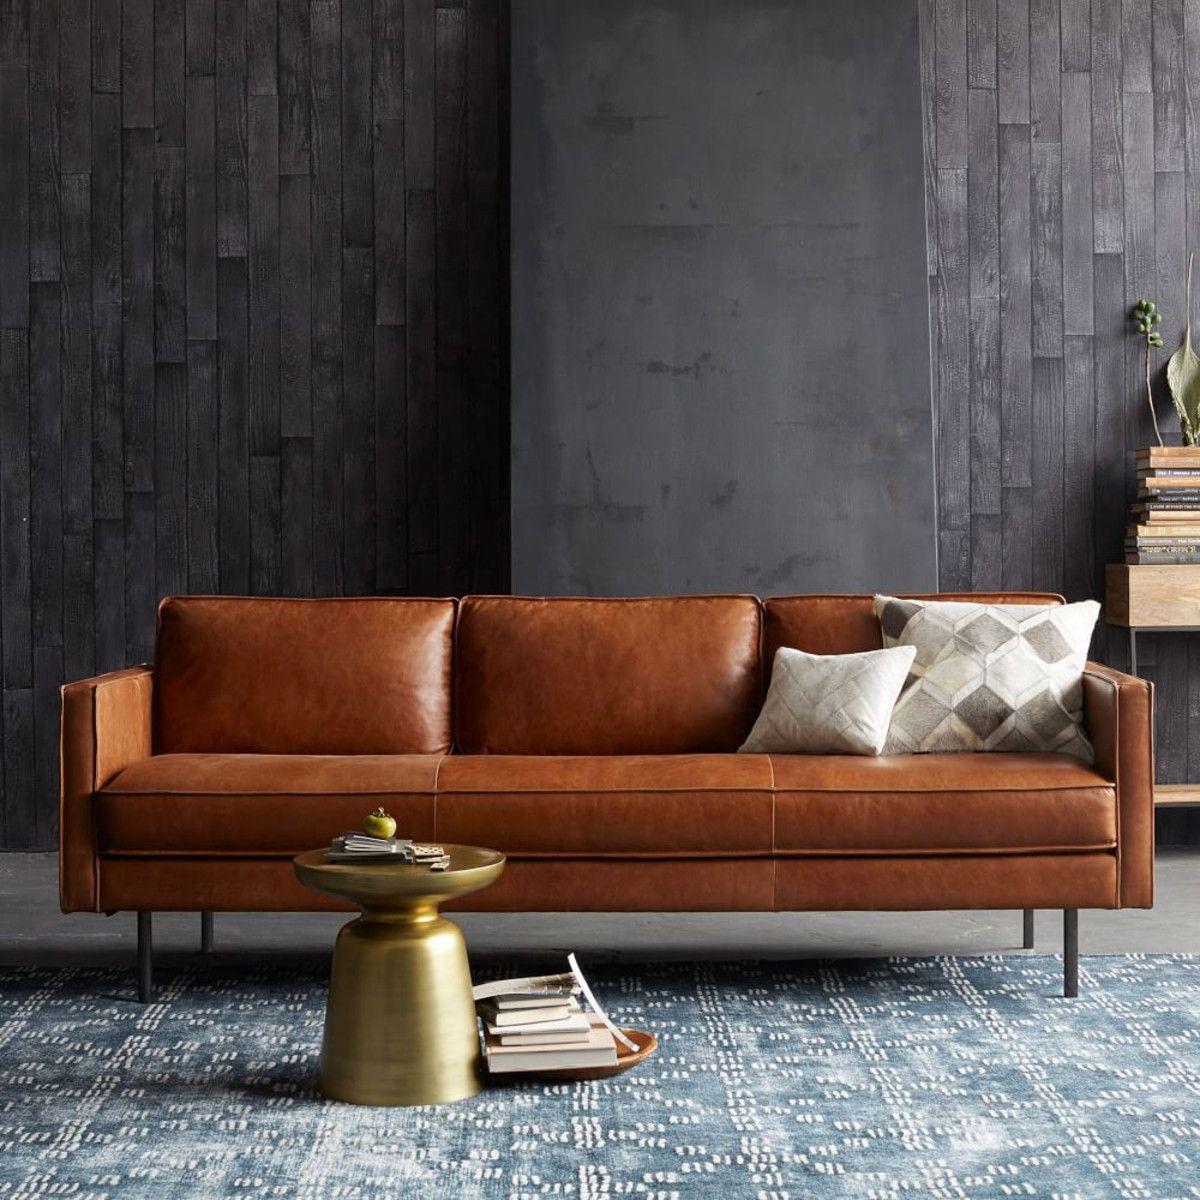 Camel Leather Sofa - Google Search